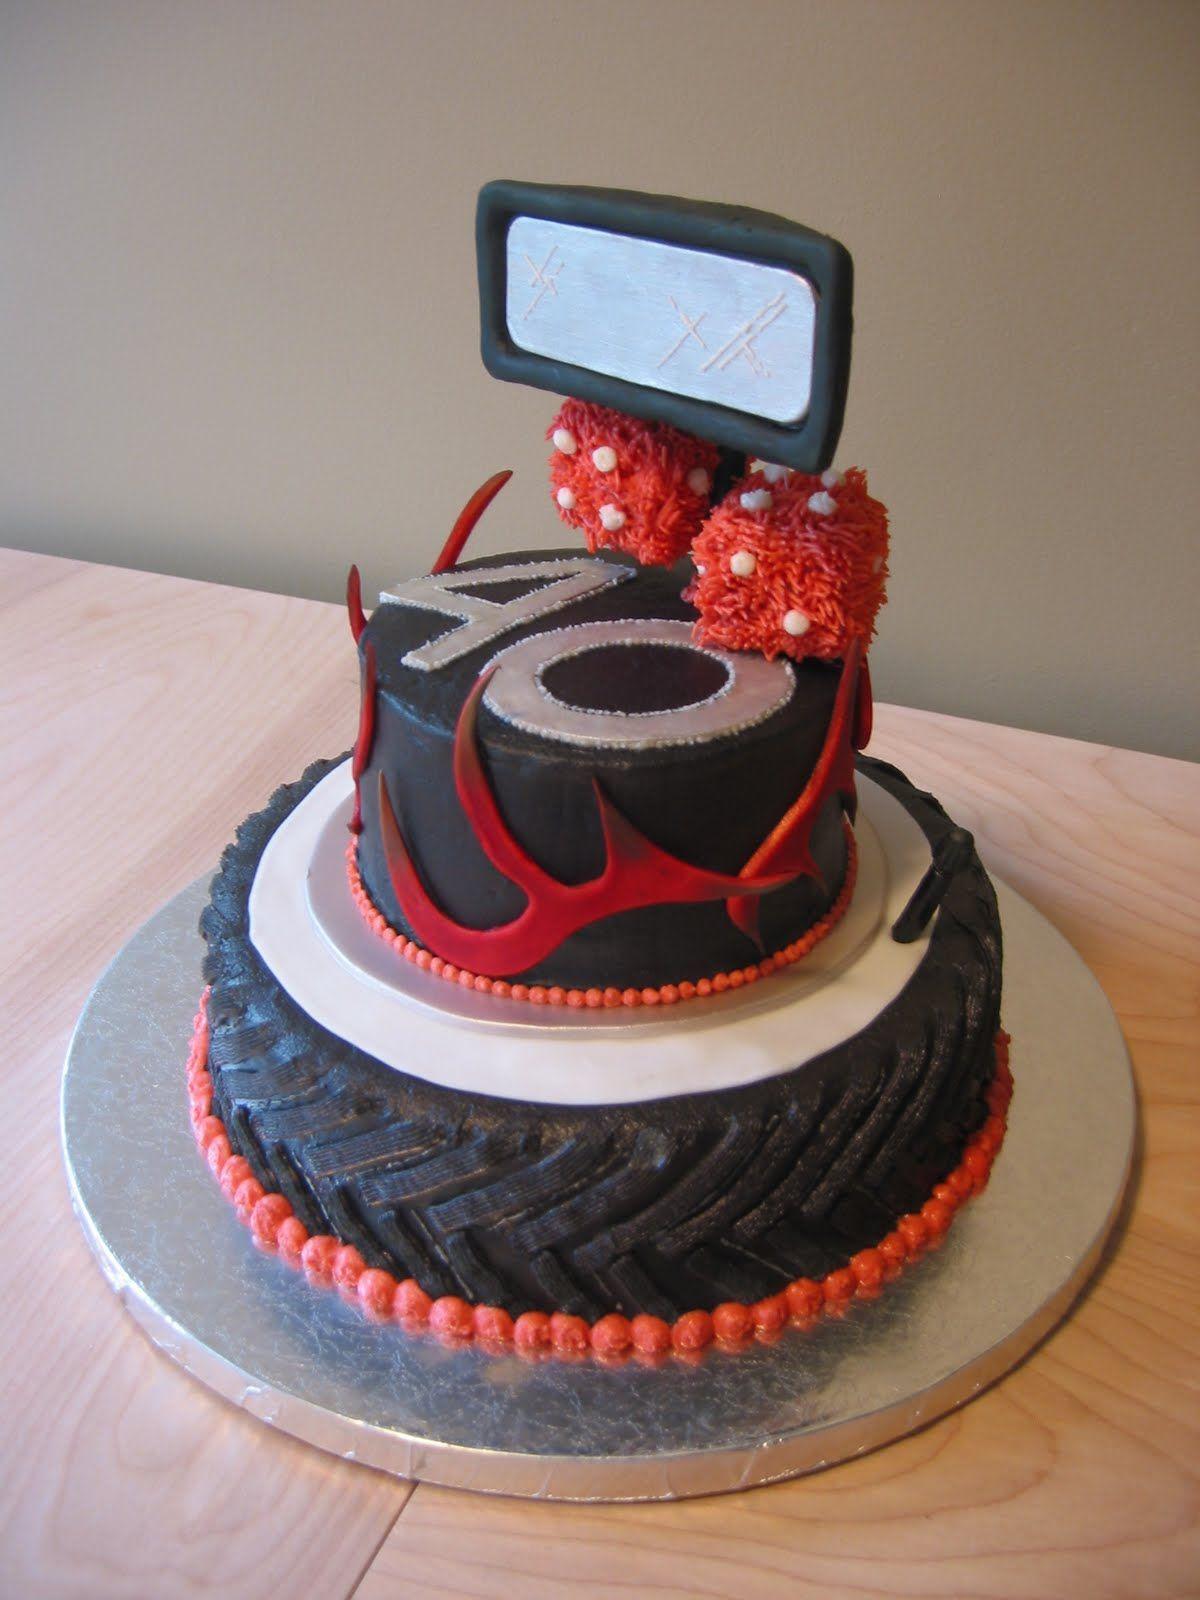 40th Birthday Cake Decorating Idea With Car Theme